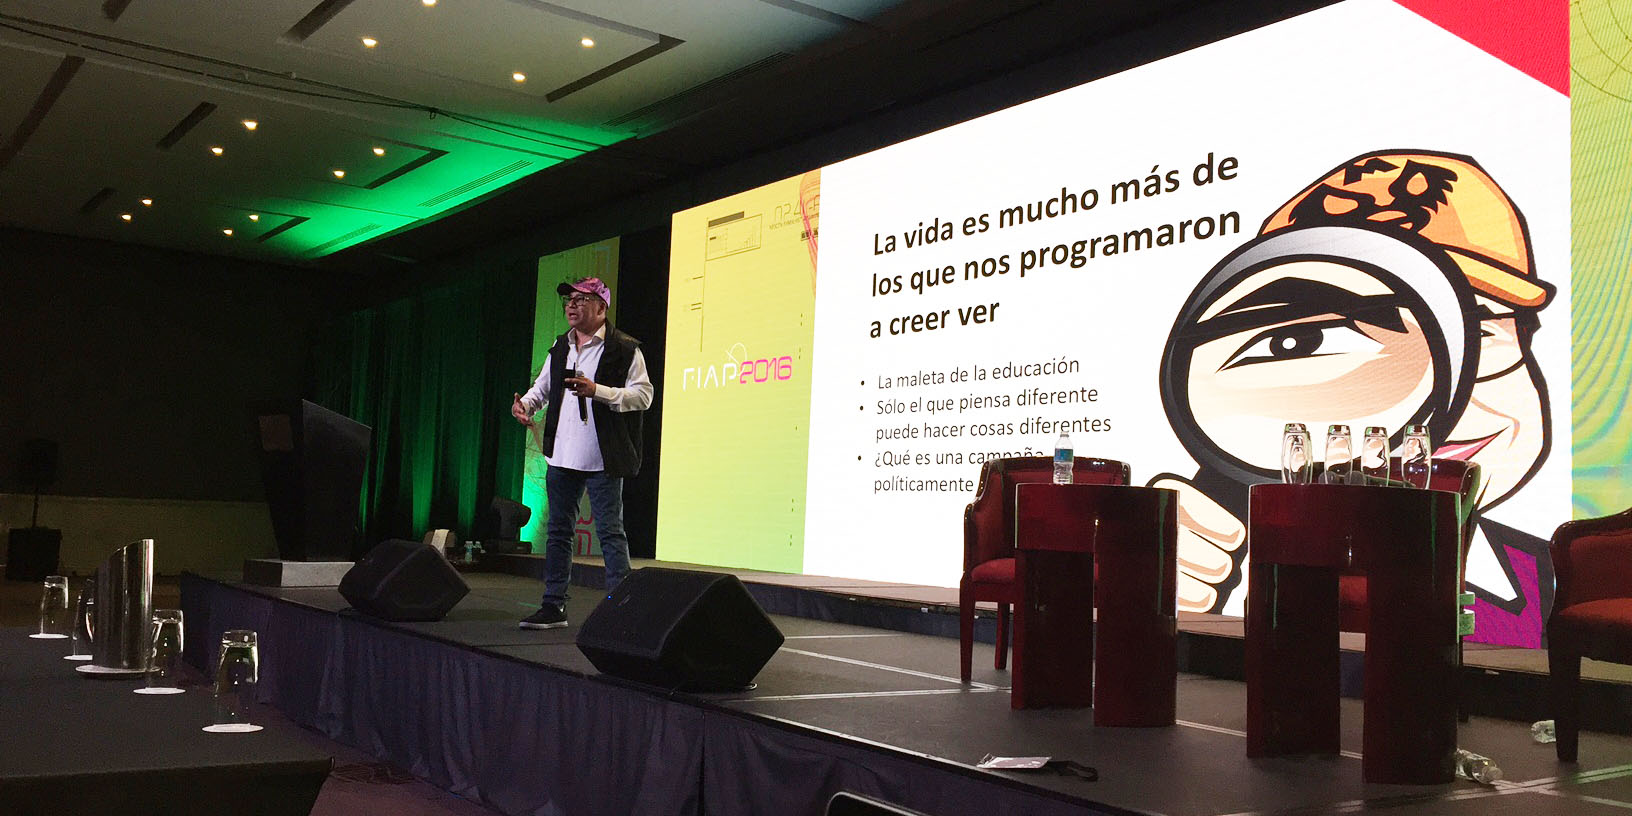 Memo-Rentería-Festival-Iberoamericano-Publicidad-2016-Alcaldes-De-México-2016